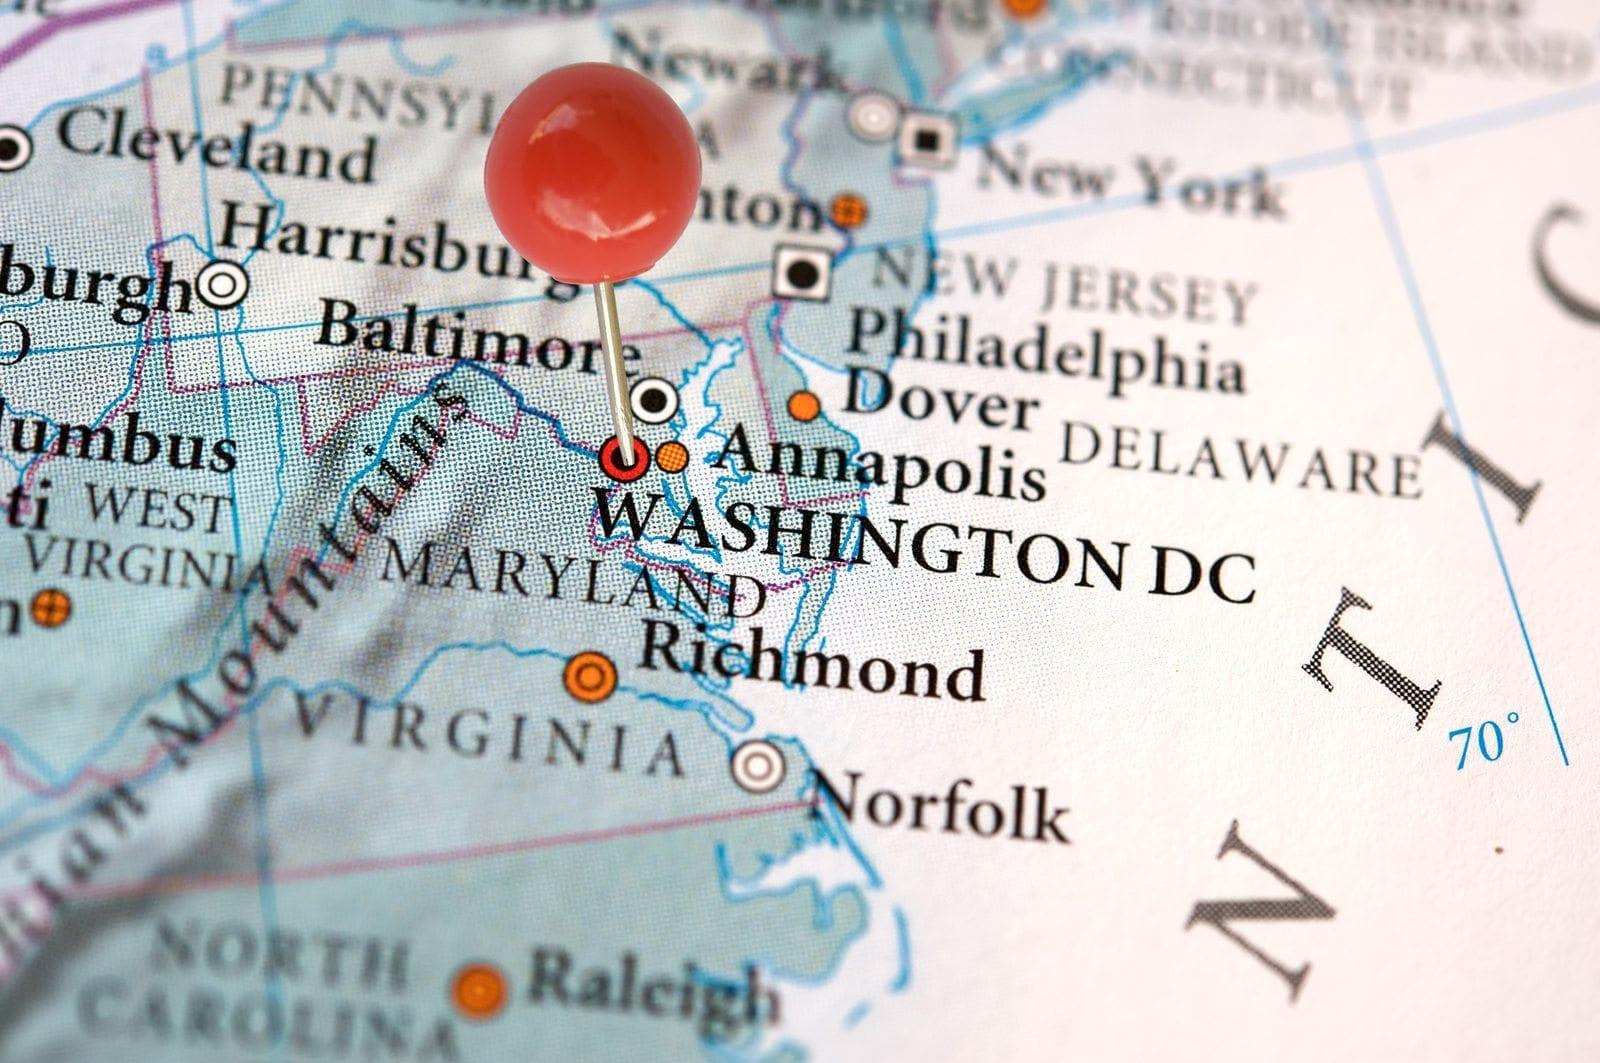 Washington DC on a map